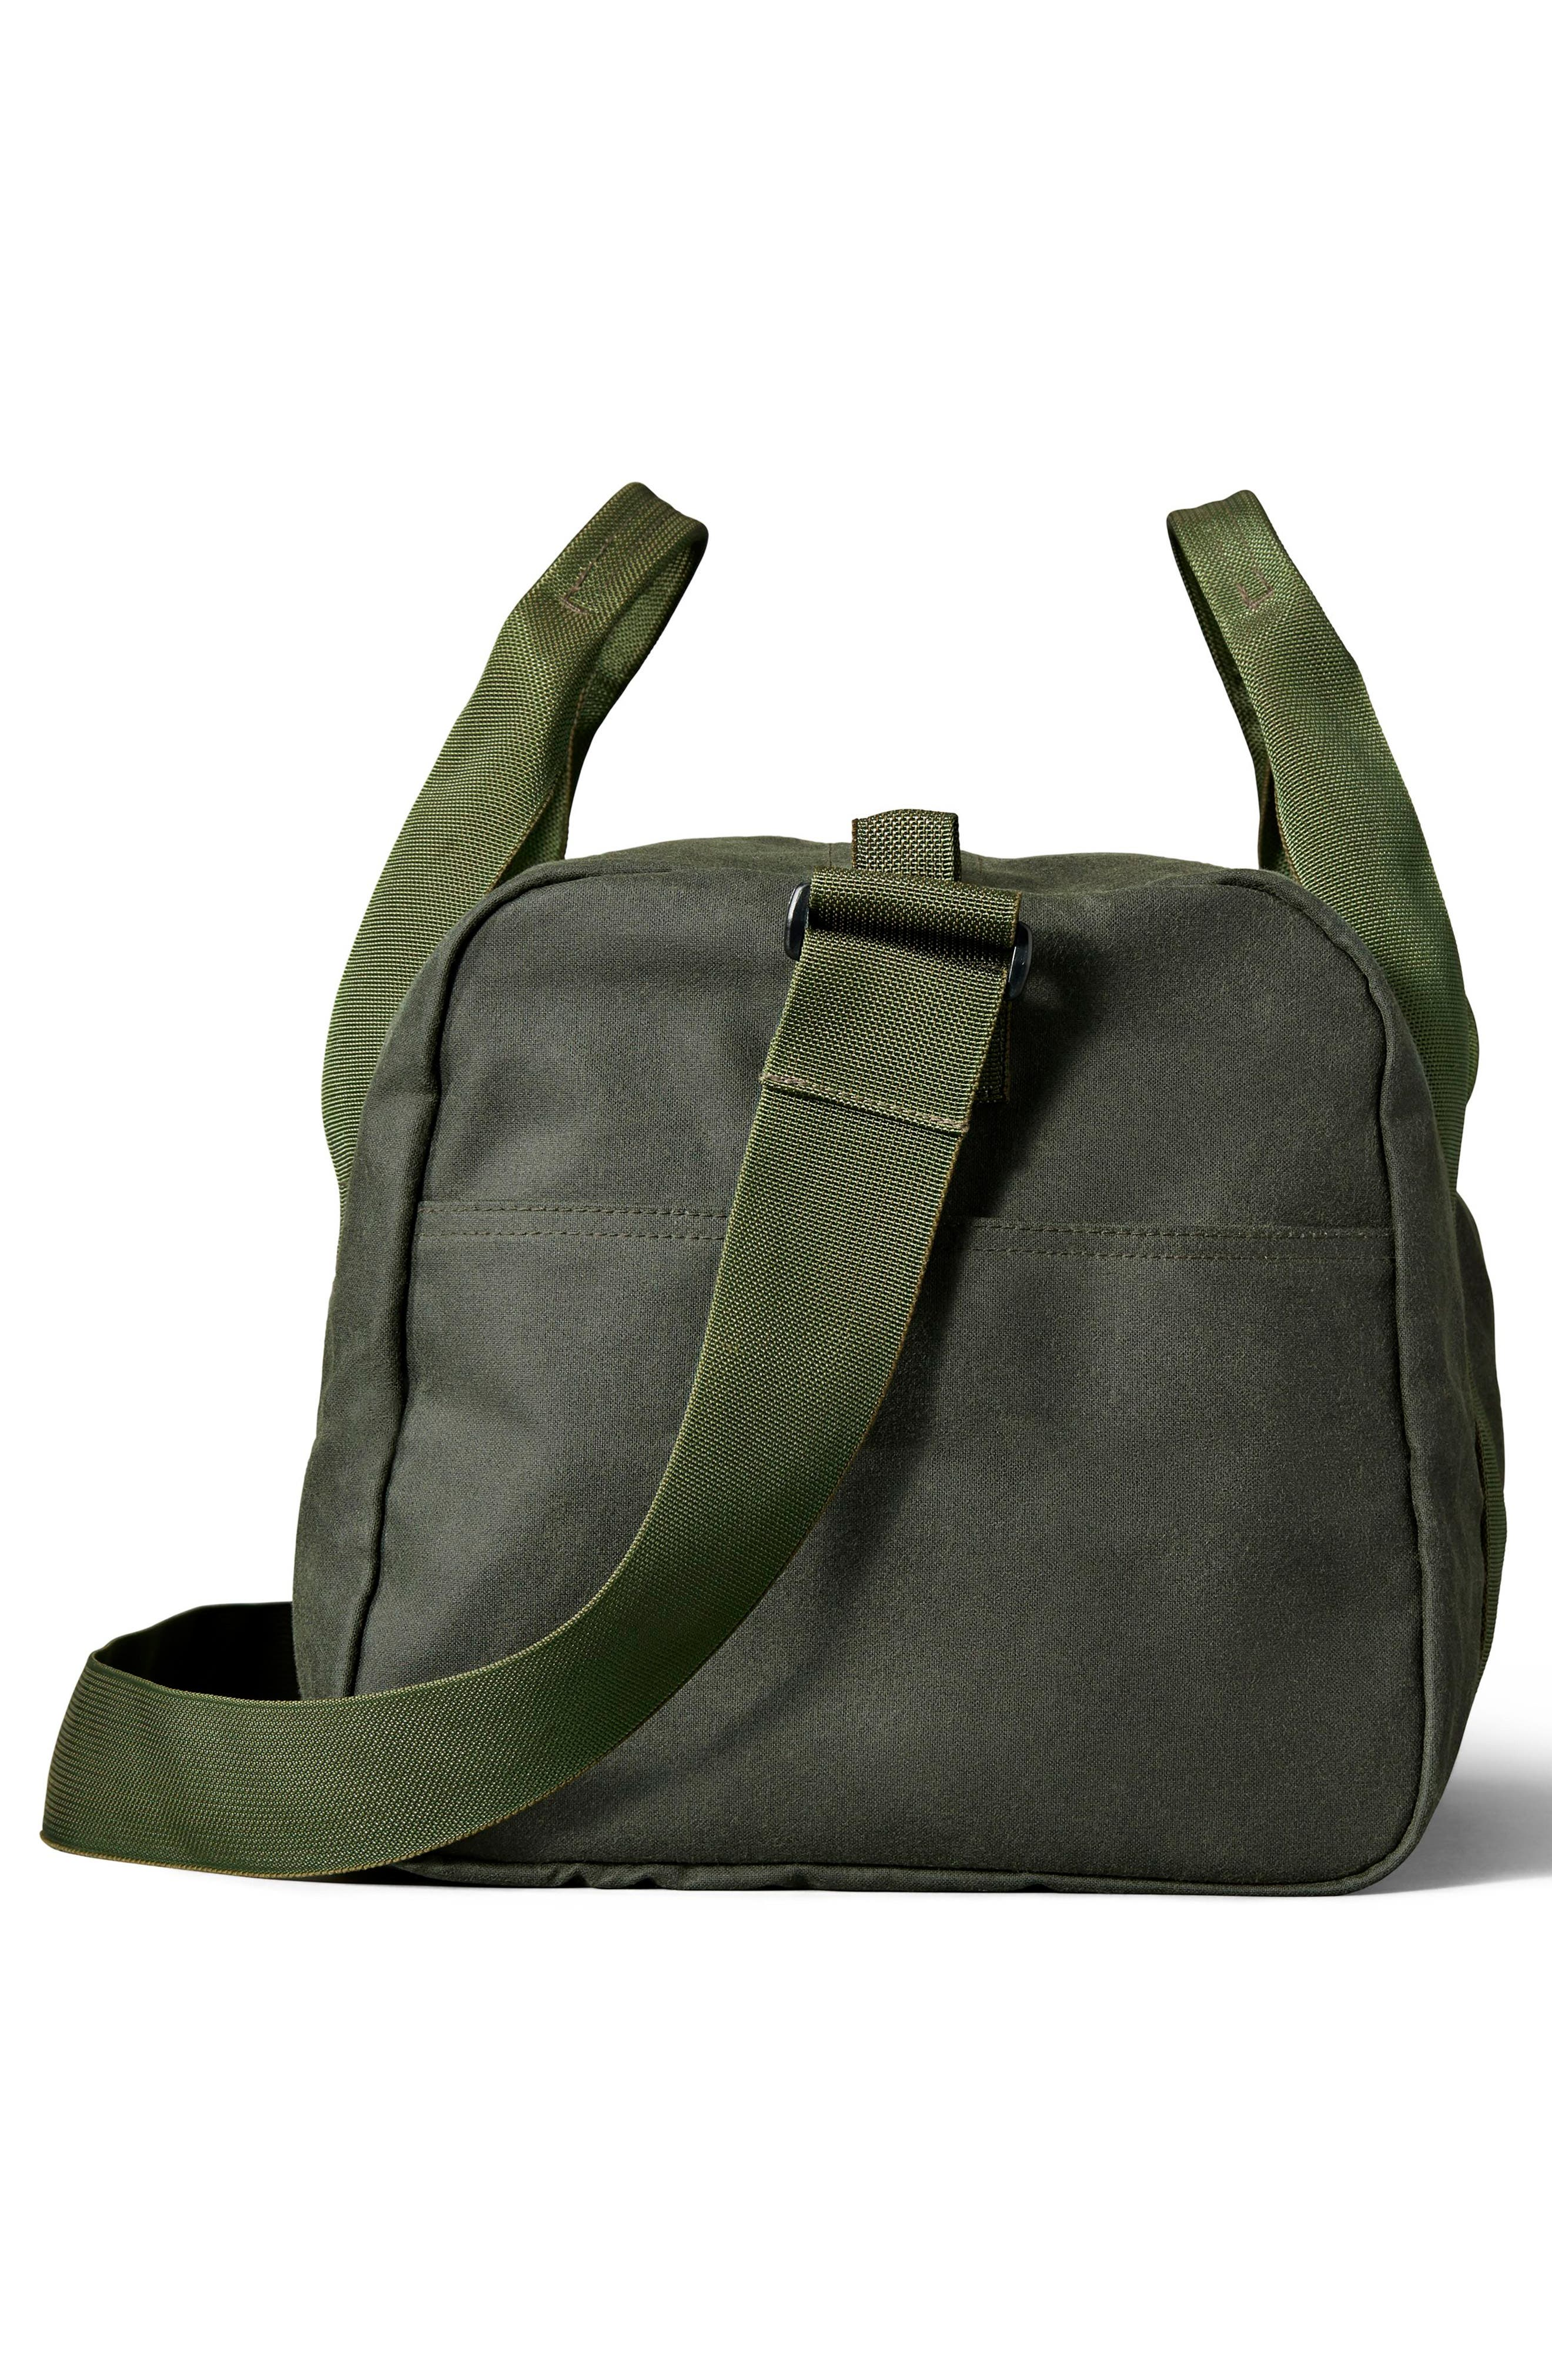 FILSON,                             Medium Field Duffel Bag,                             Alternate thumbnail 4, color,                             SPRUCE